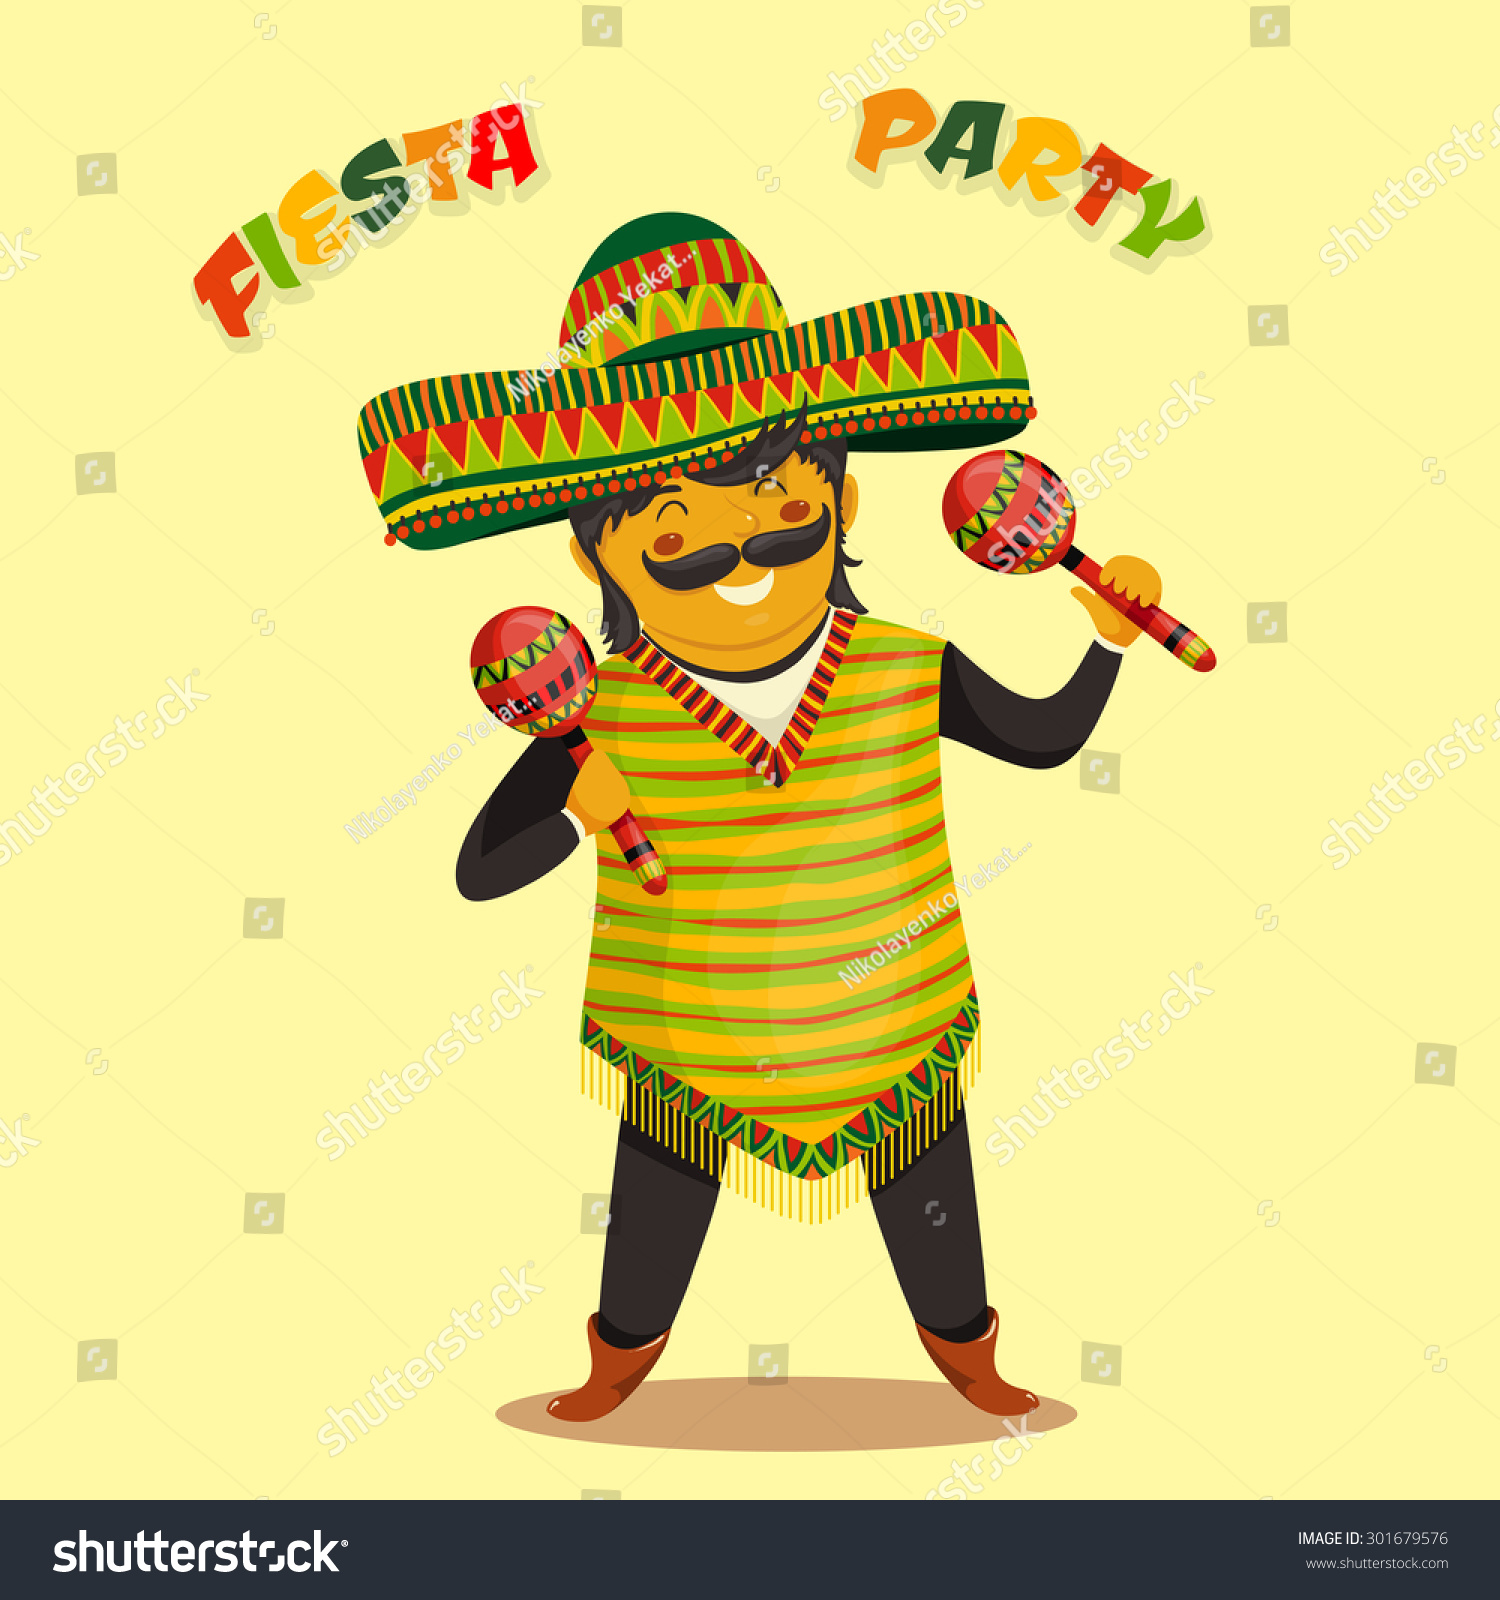 Mexican Fiesta Party Invitation Mexican Man Stock Vector 301679576 ...